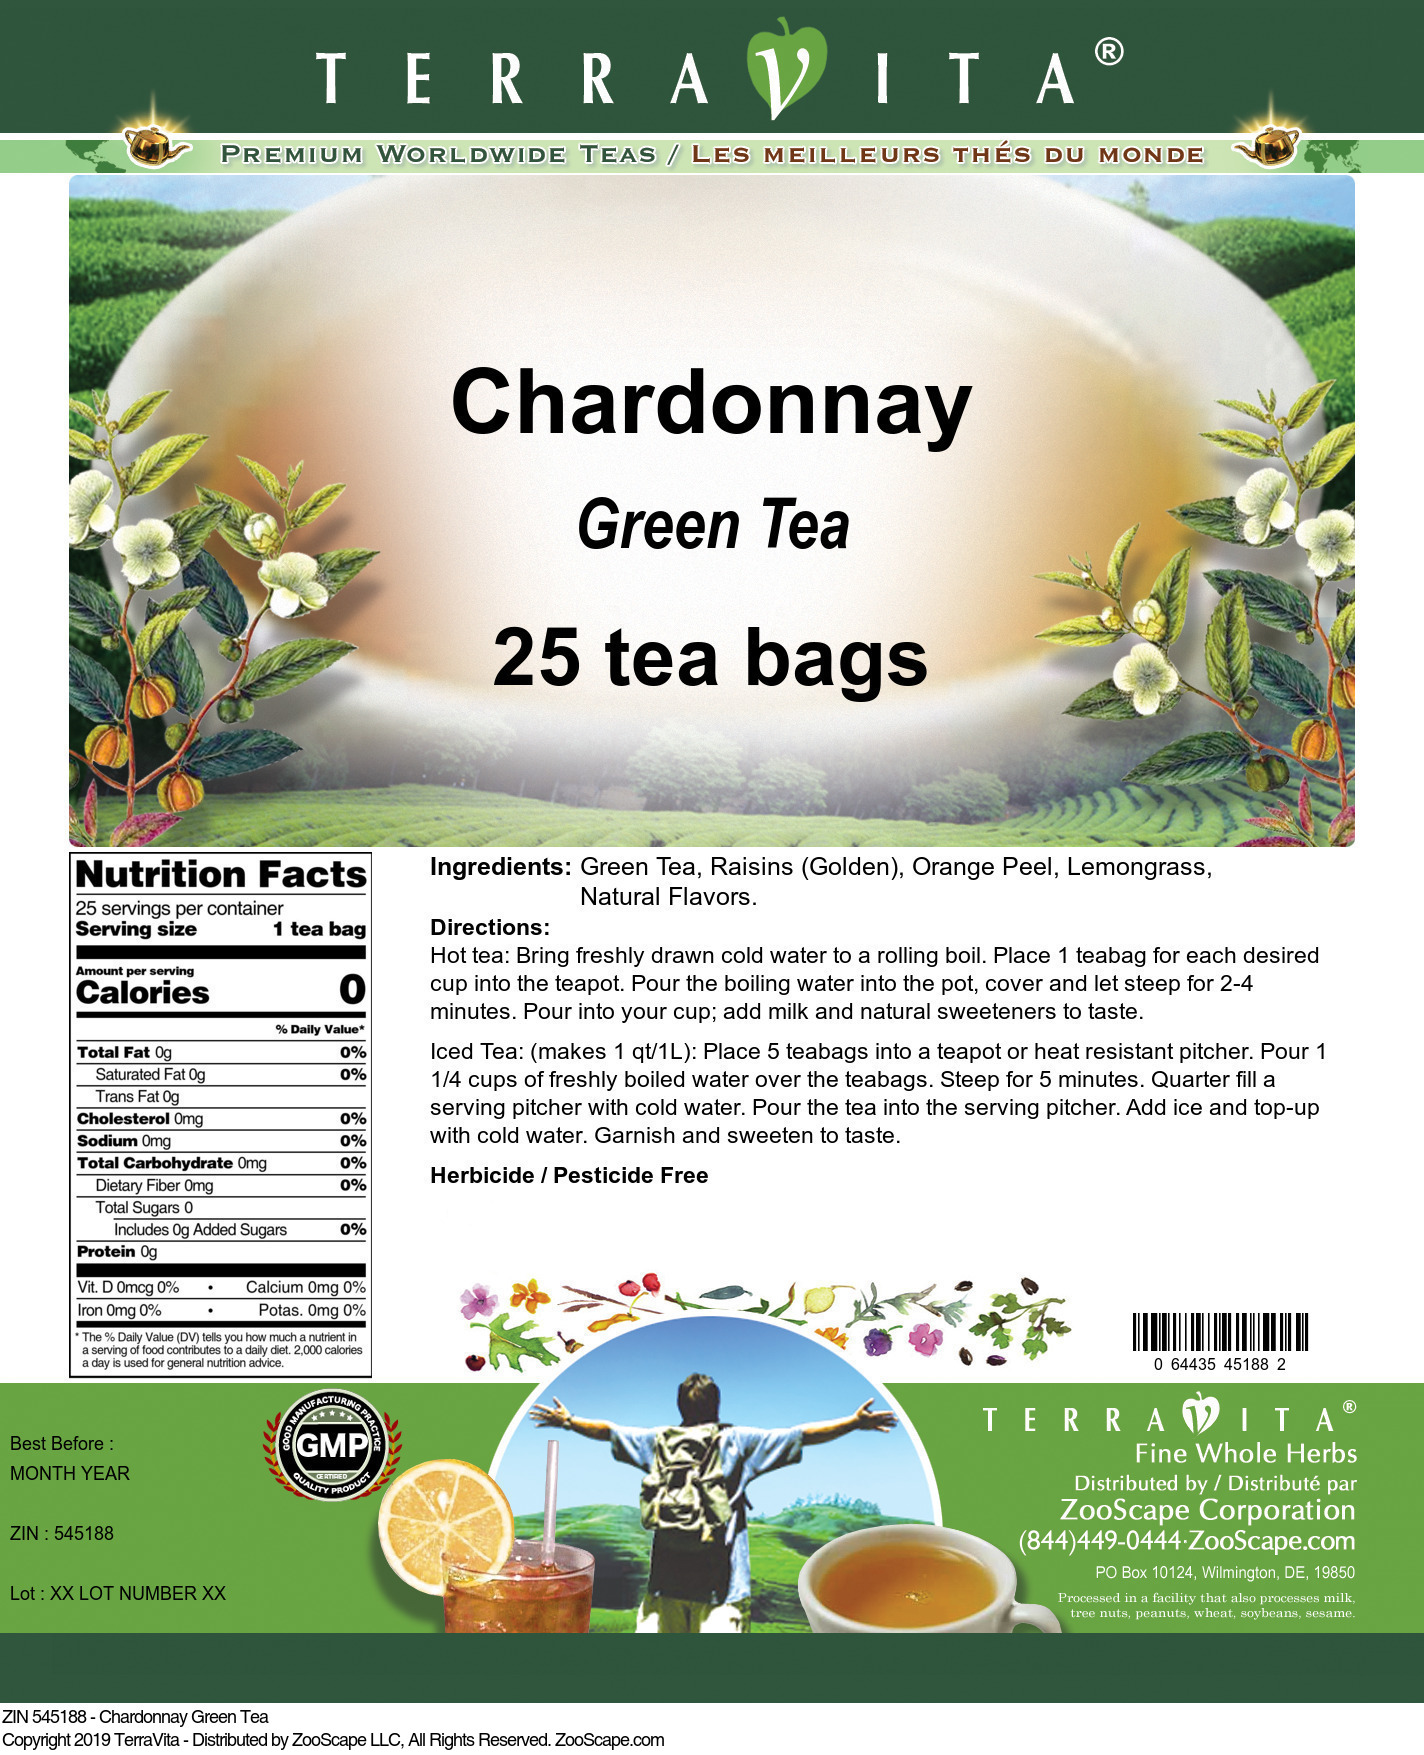 Chardonnay Green Tea